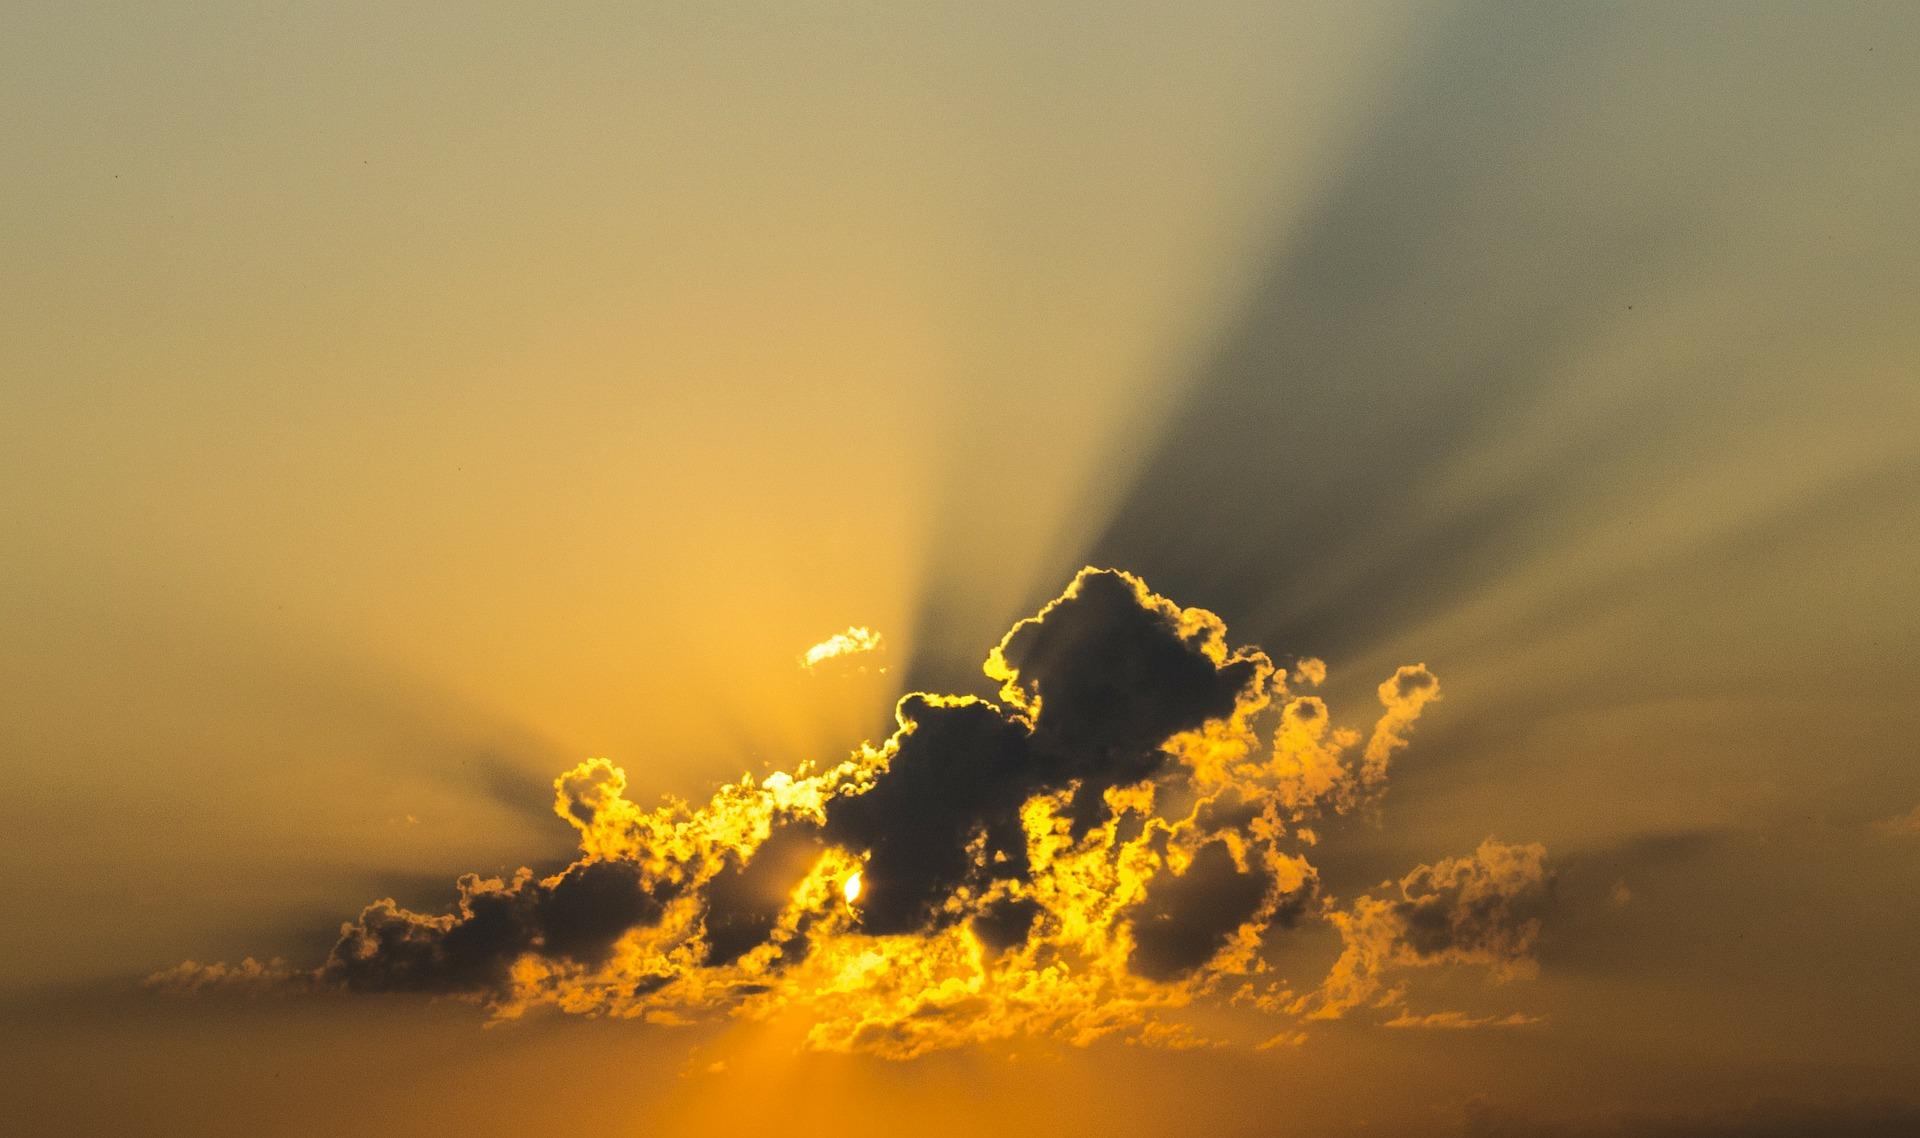 sol ceu nuvem foro pixabay